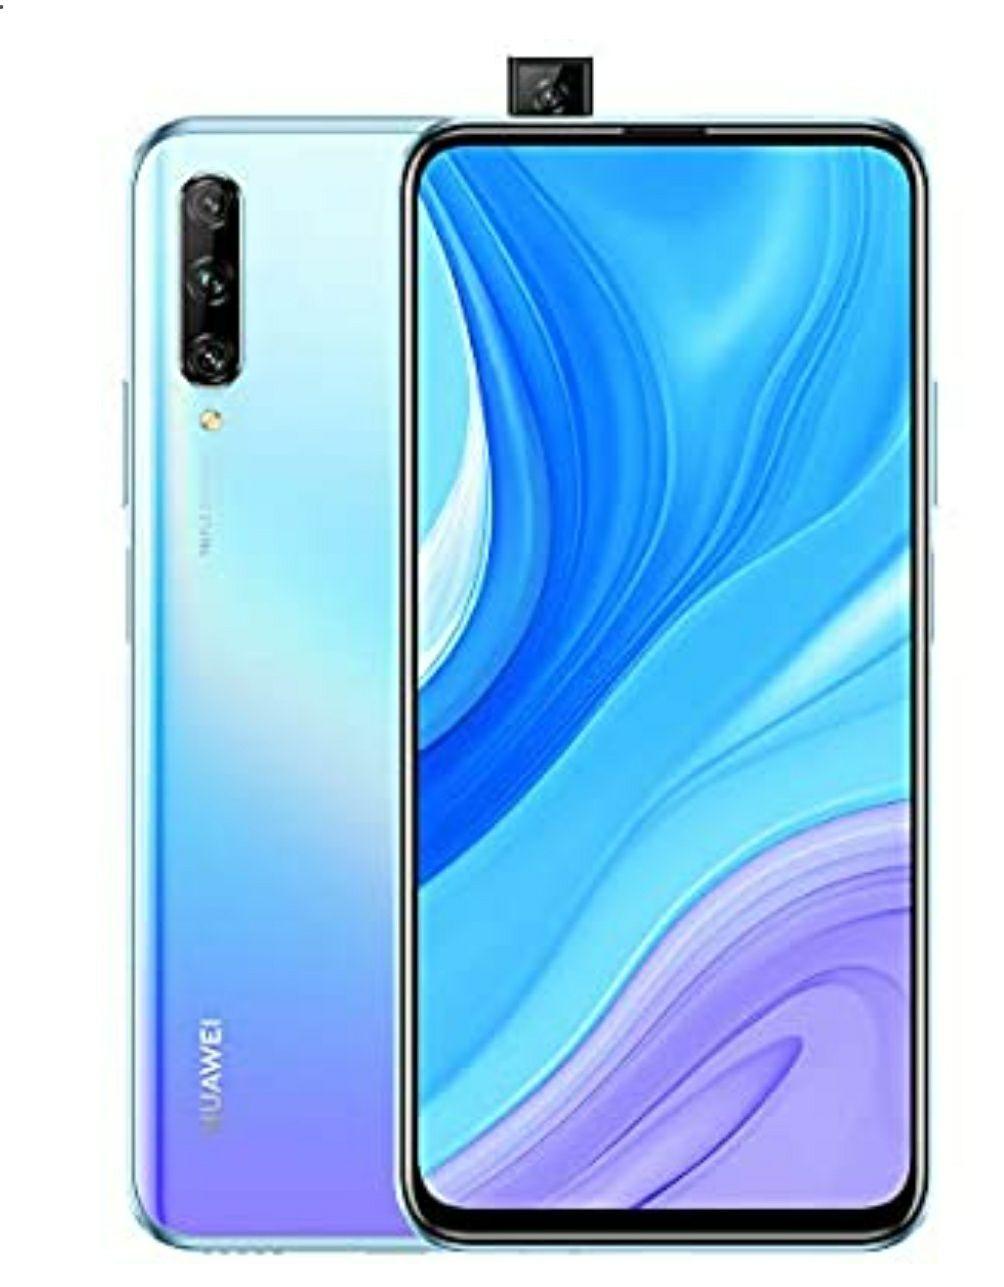 HUAWEI P Smart Pro - 128GB Smartphone 4000mAh - £169.99 @ Amazon